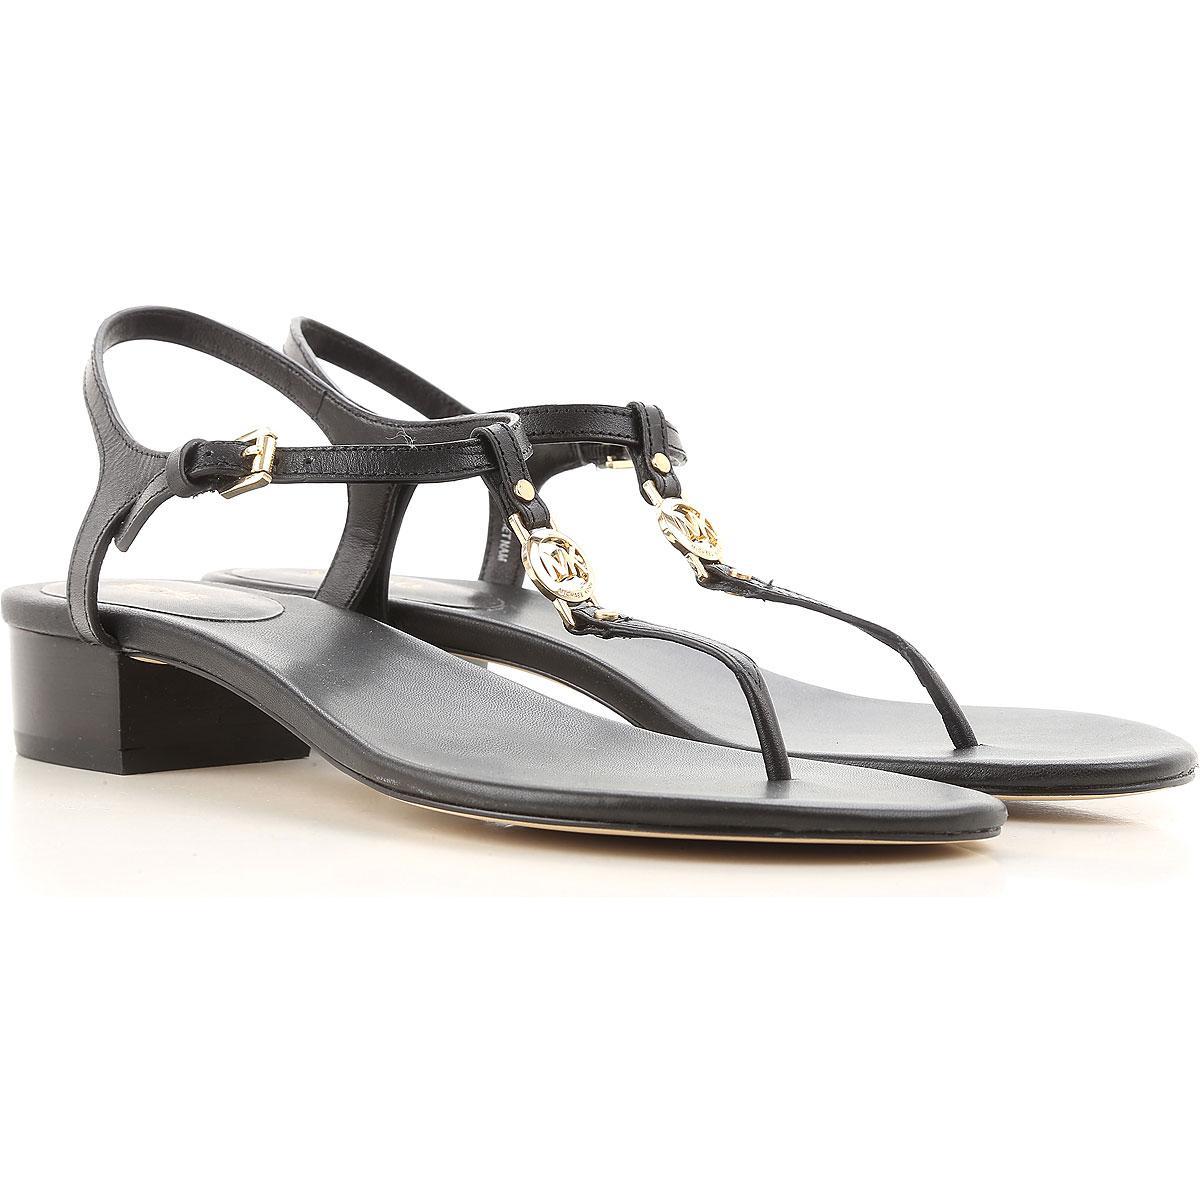 bf4e2e930a83 Michael Kors Shoes For Women - Lyst